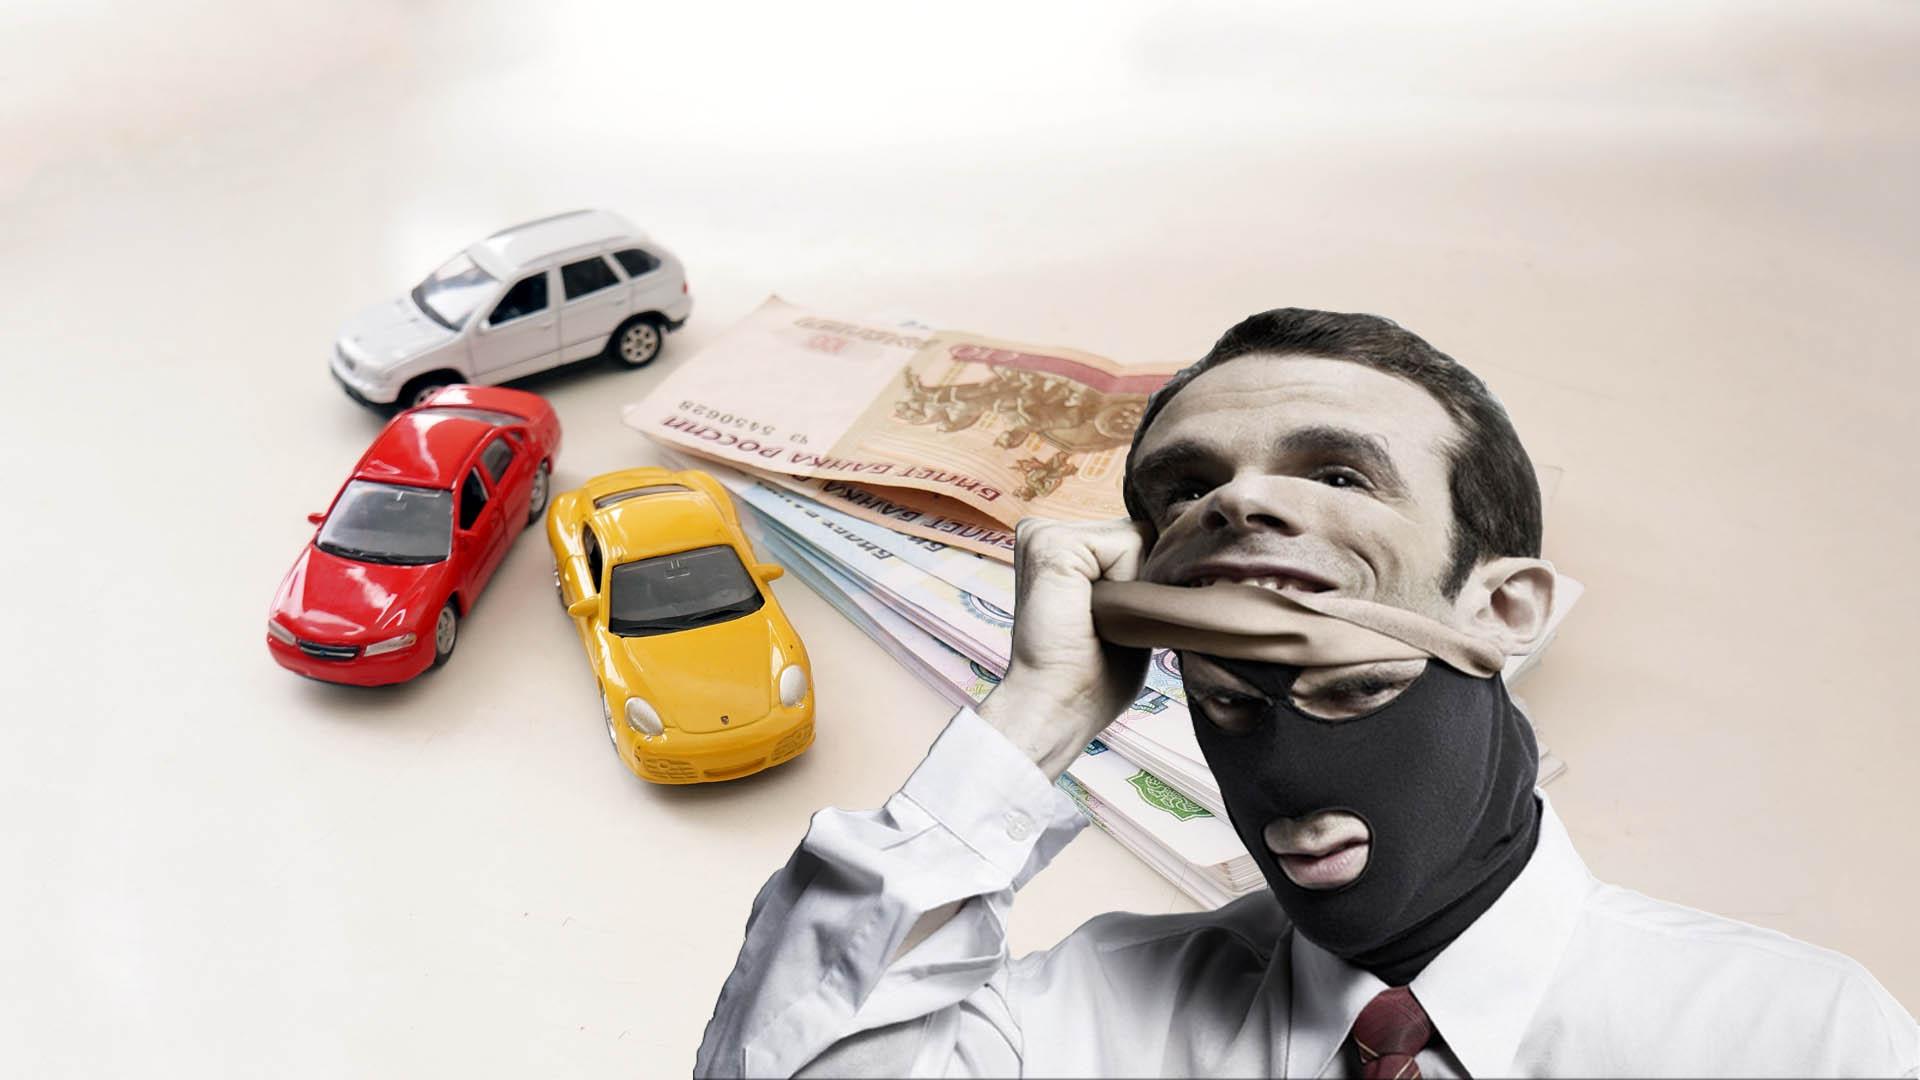 Залог автомобиля без согласия супруга деньги под залог недвижимости части